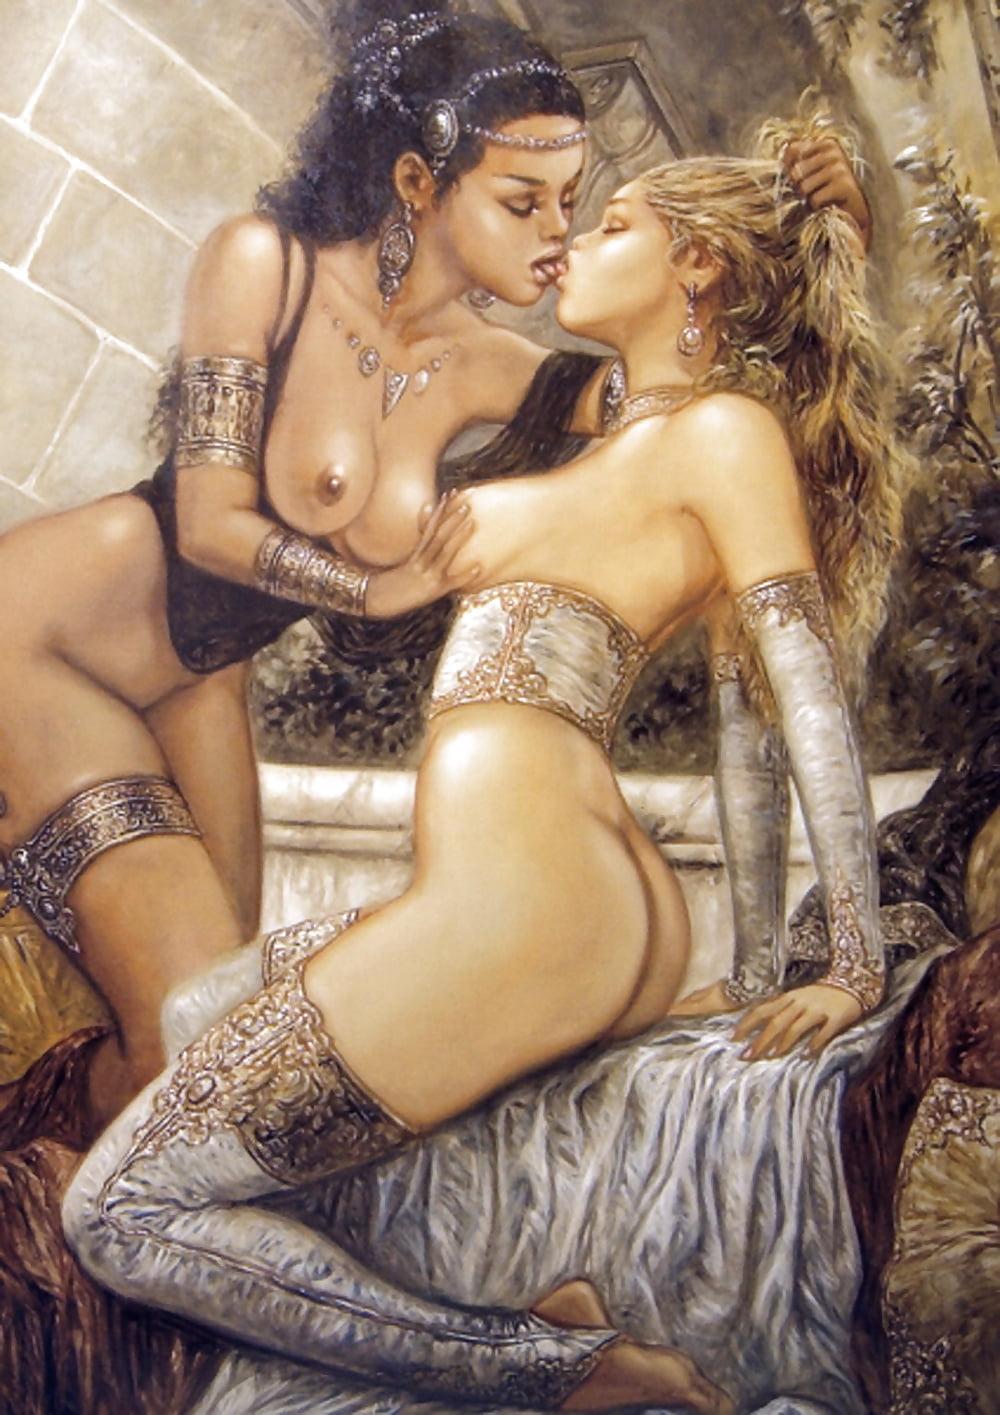 Robo lesbian in erotic art, asian girl taken advantage